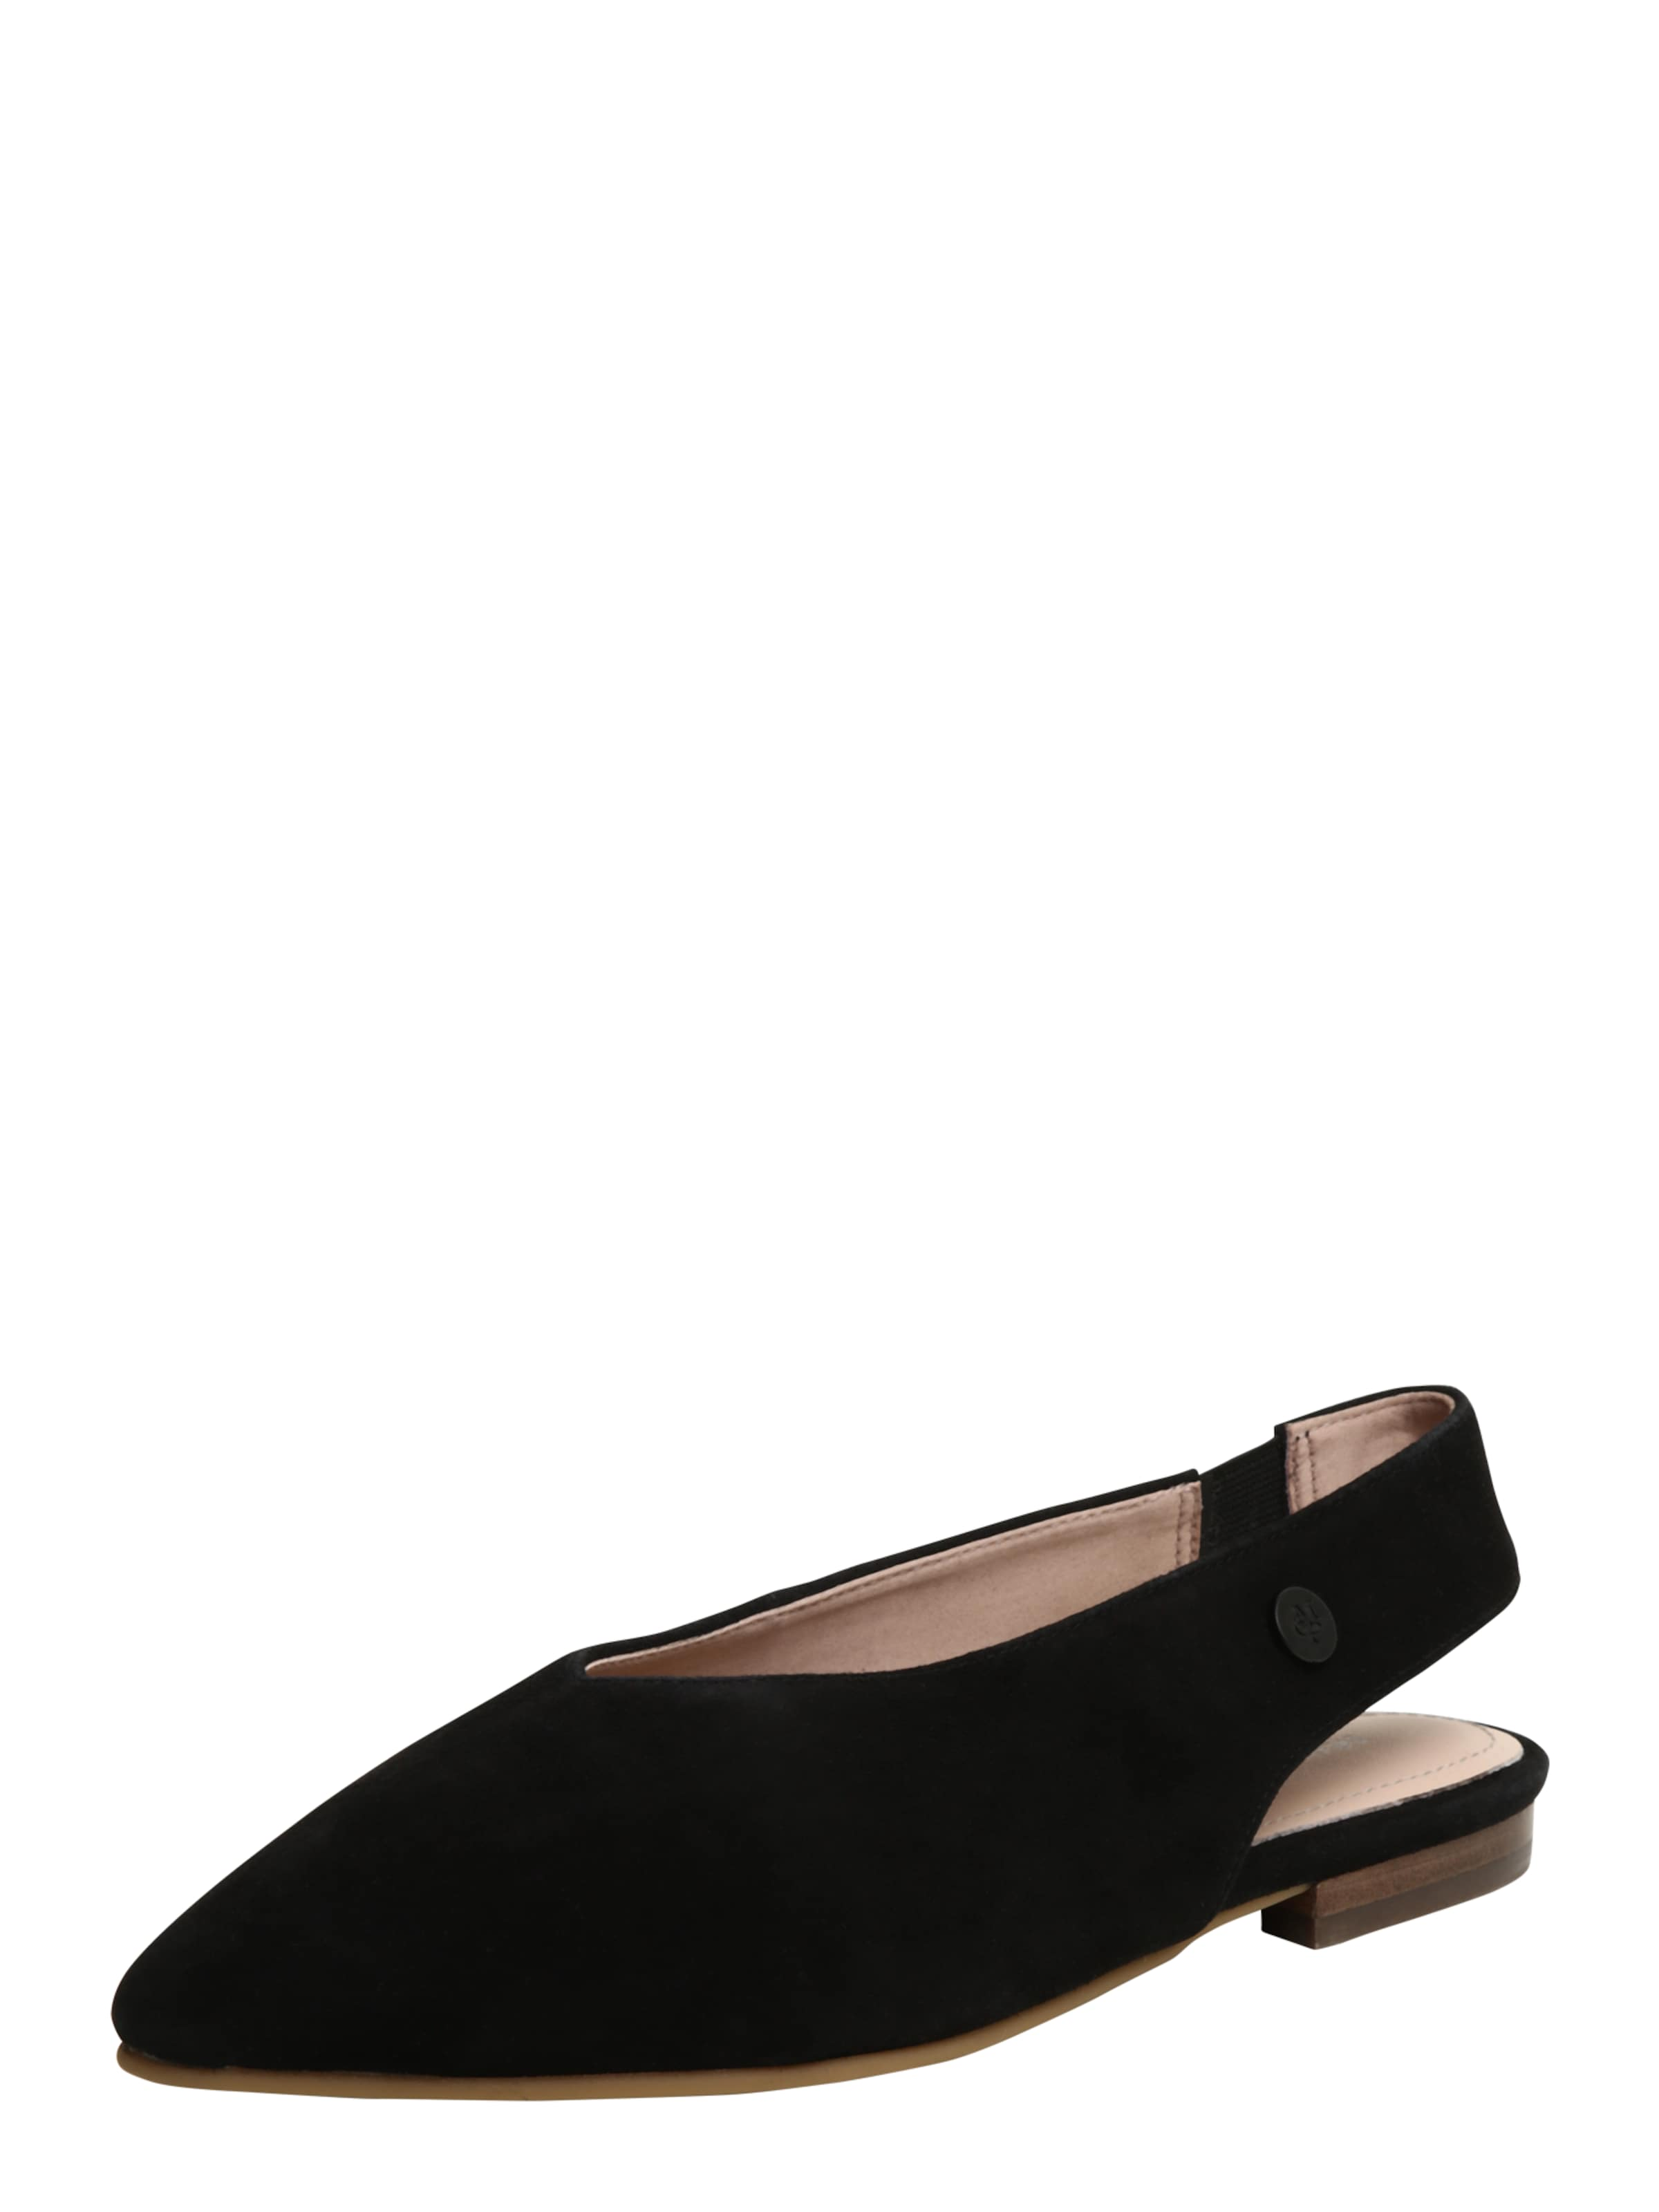 Marc O'Polo | Slingback getragene Ballerina in Veloursleder Schuhe Gut getragene Slingback Schuhe ff918d